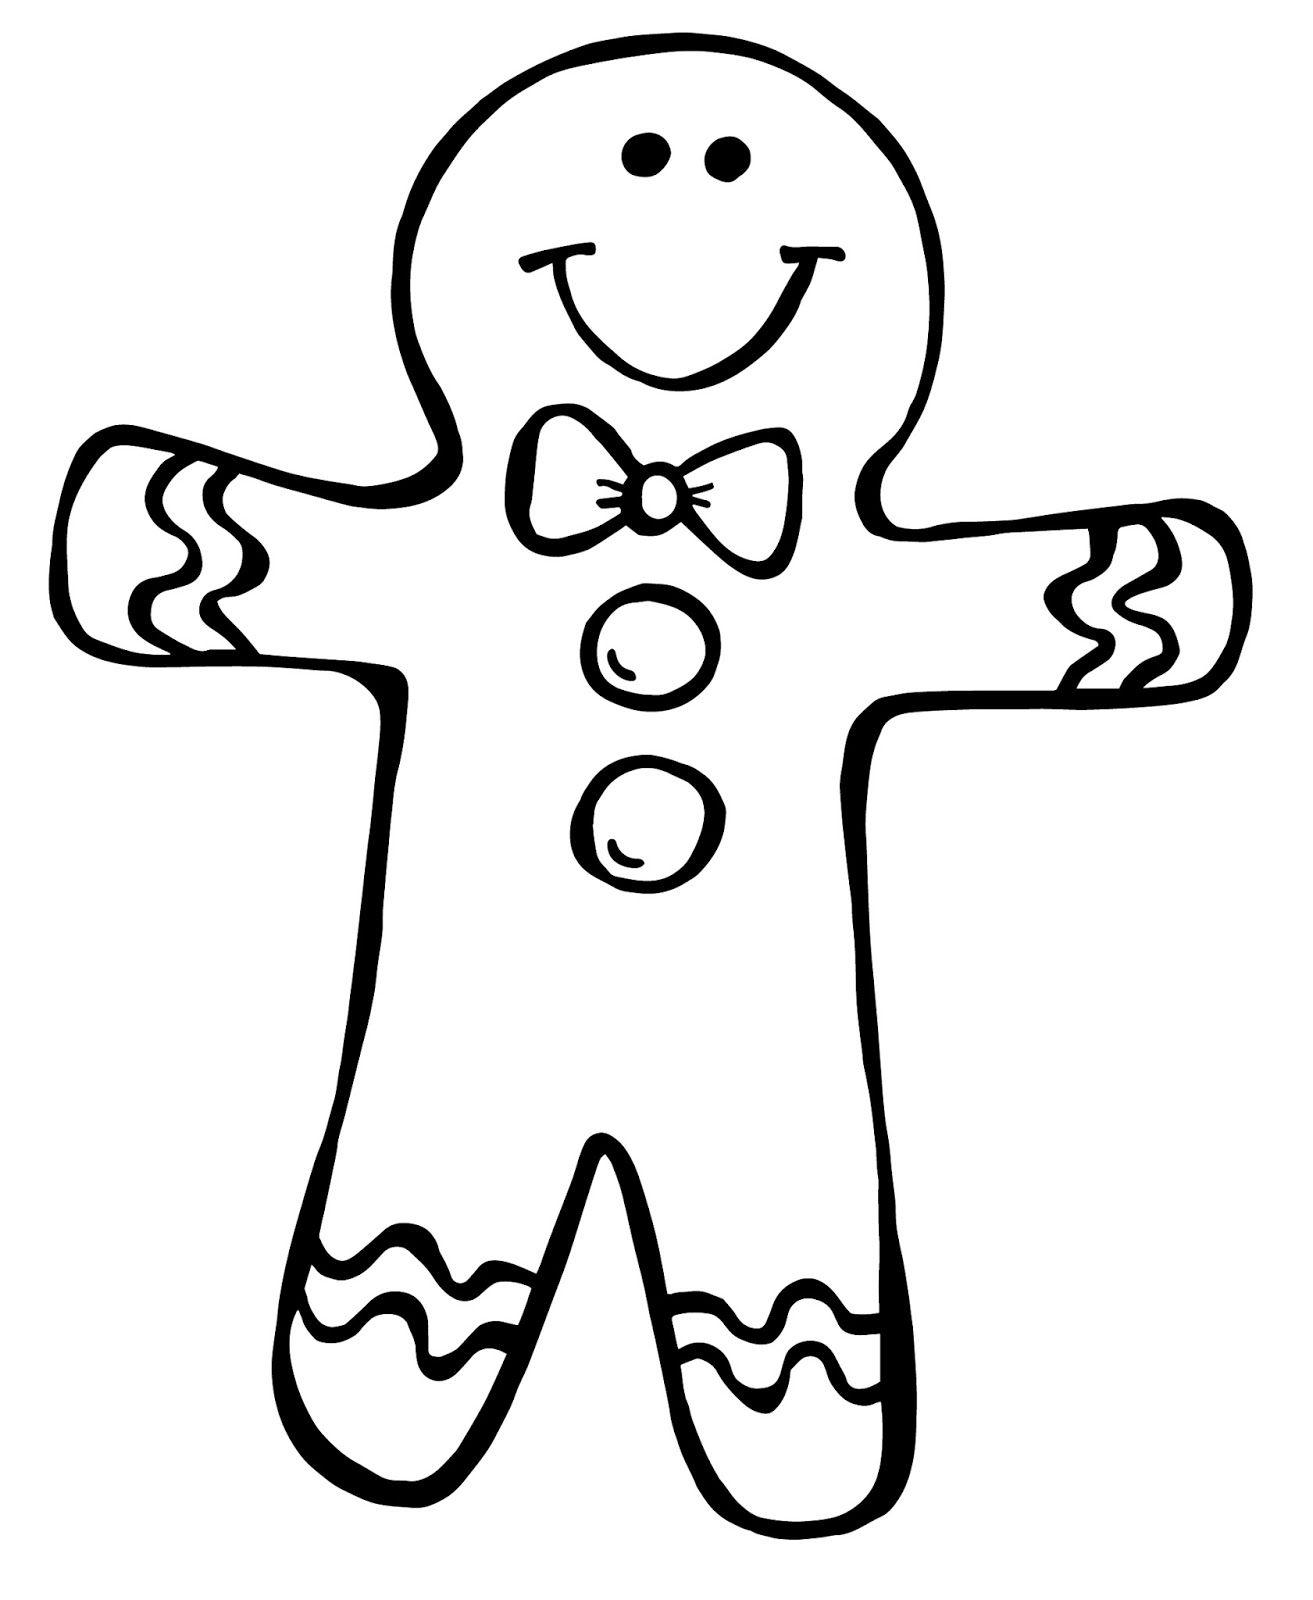 FREE Gingerbread Boy & Girl Clipart.